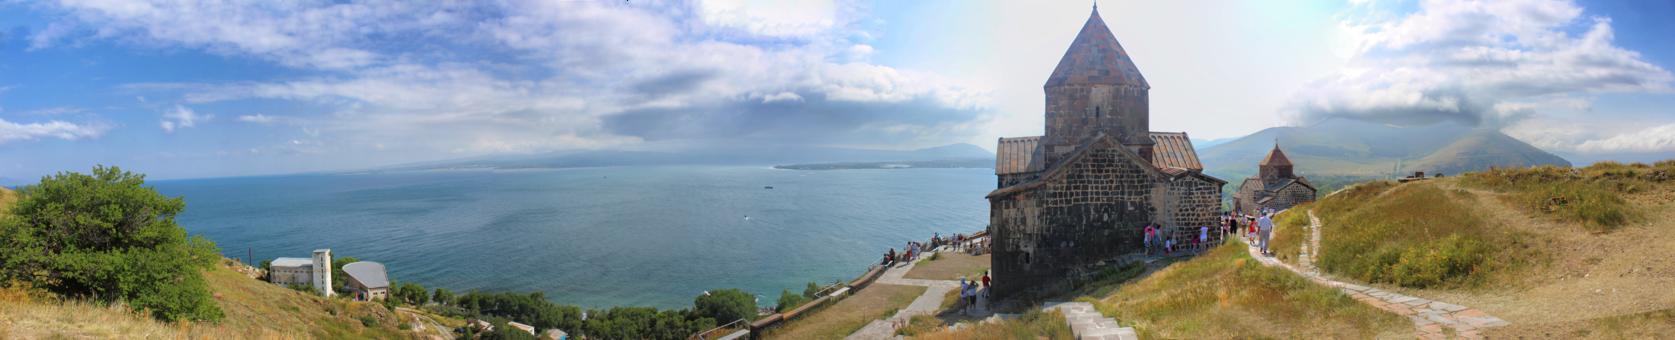 Panorama of Sevanavank.png